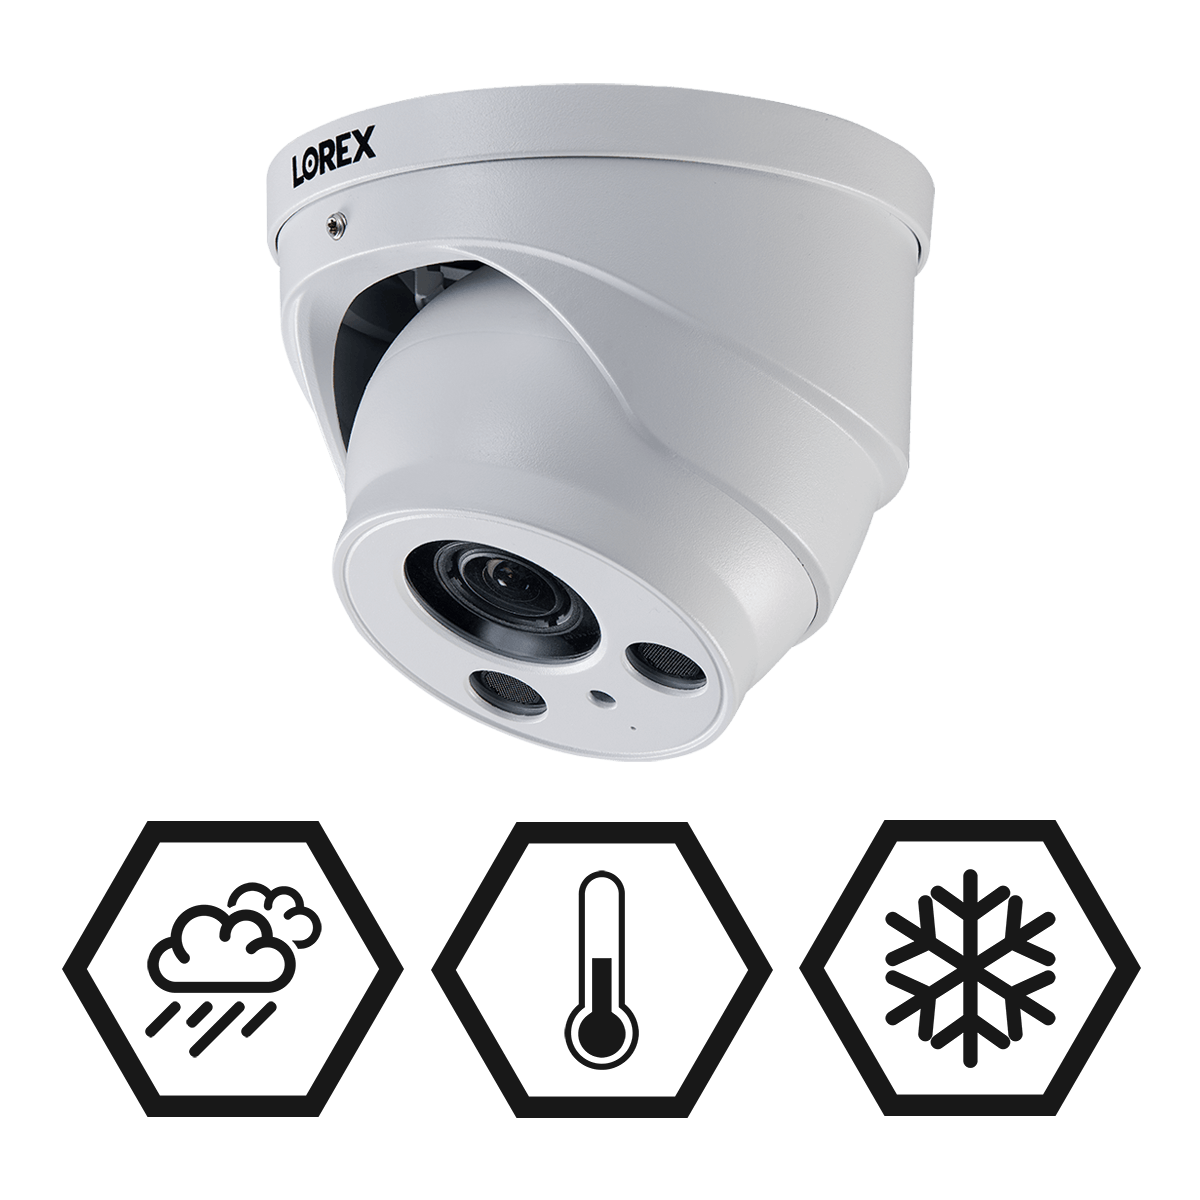 4K nocturnal weatherproof security camera